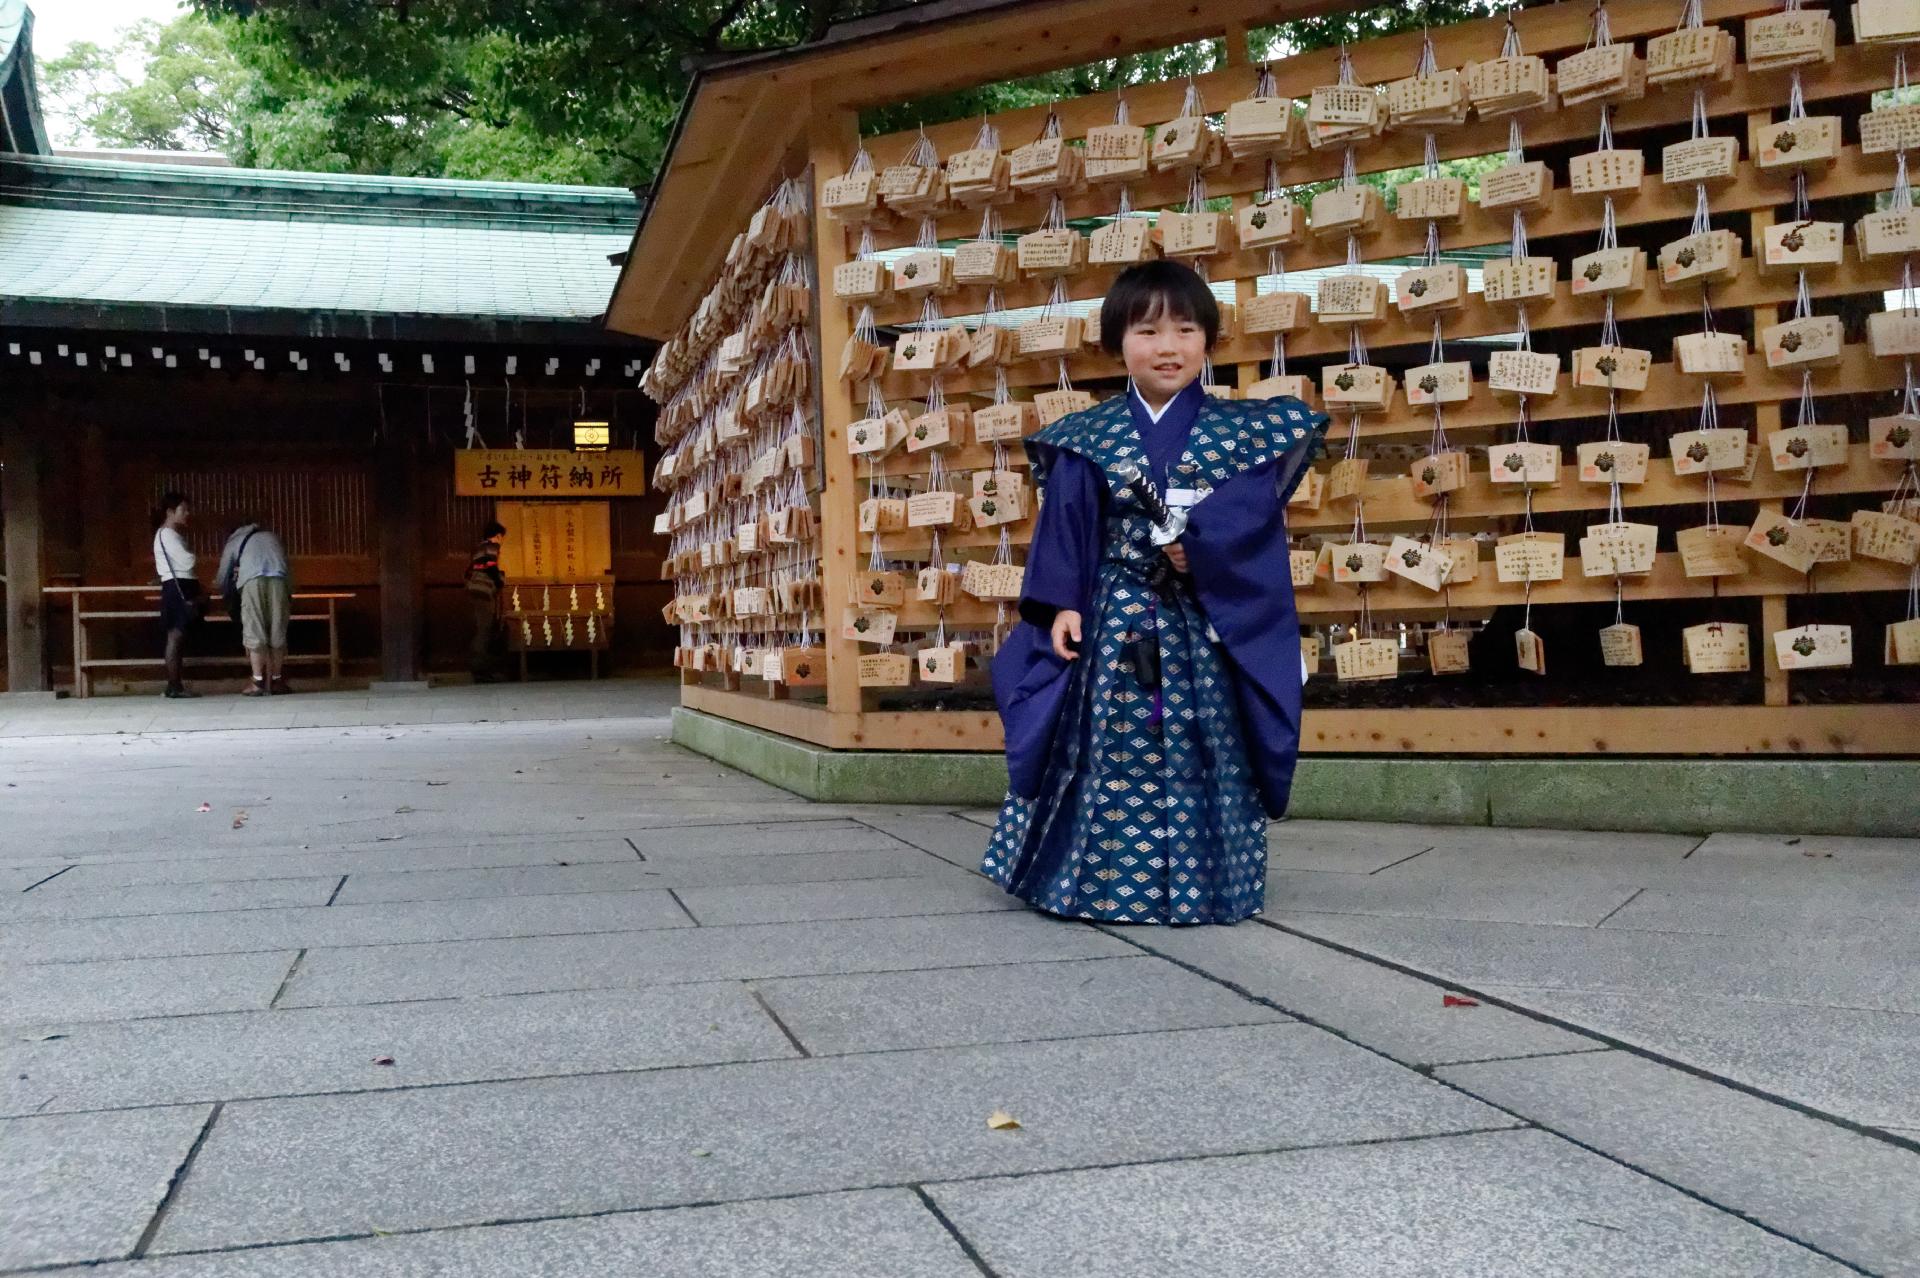 Yoyoji park, Tokyo Japan, traditional image by ©Akin Abayomi